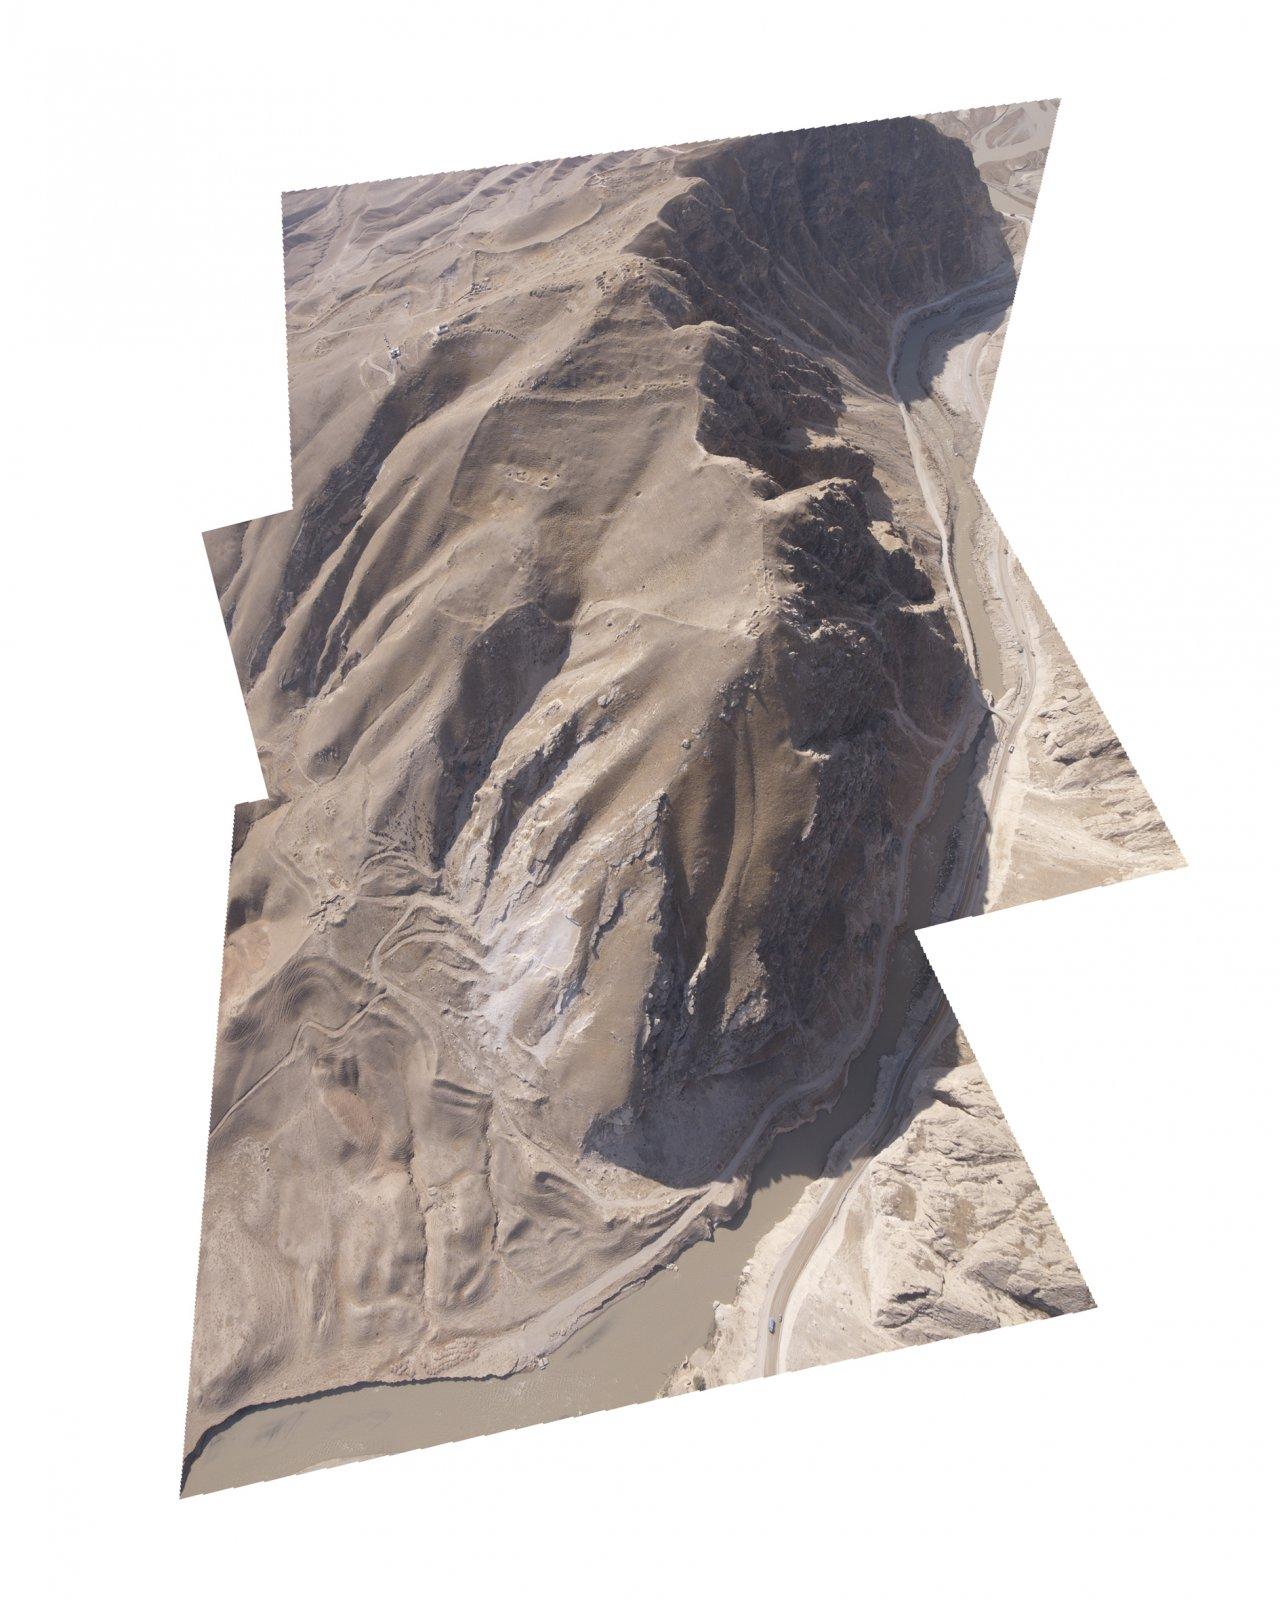 Ruins (Season 1), The Balkh-AB gorges, Afghanistan 2011 © Raphaël Dallaporta